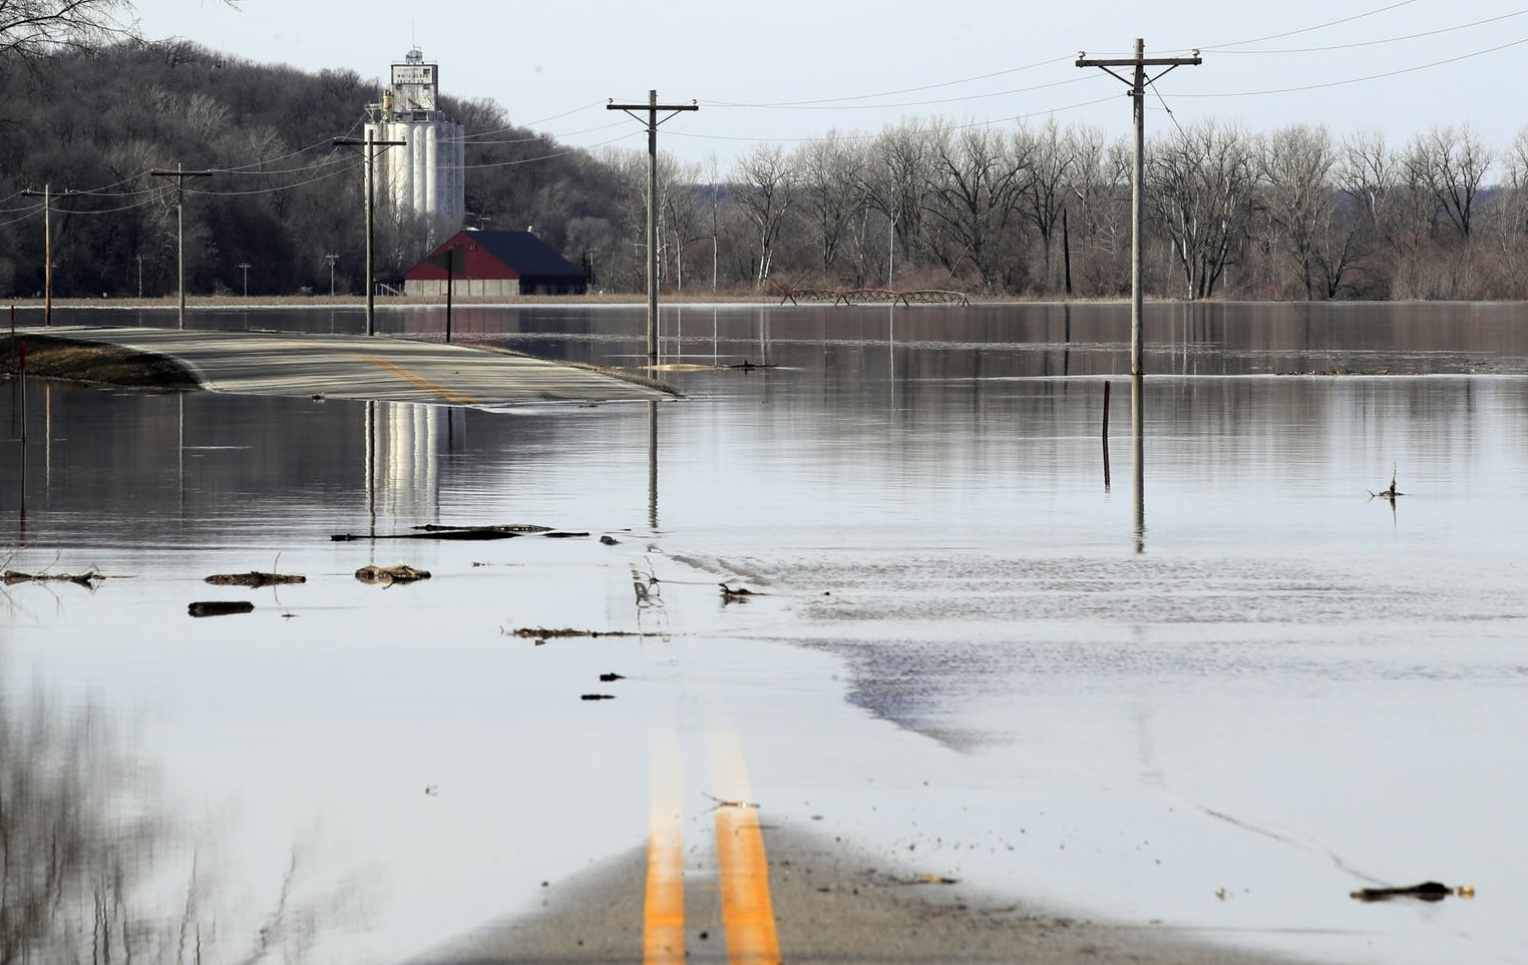 Paul Douglas: Will rapid warming increase flood risk